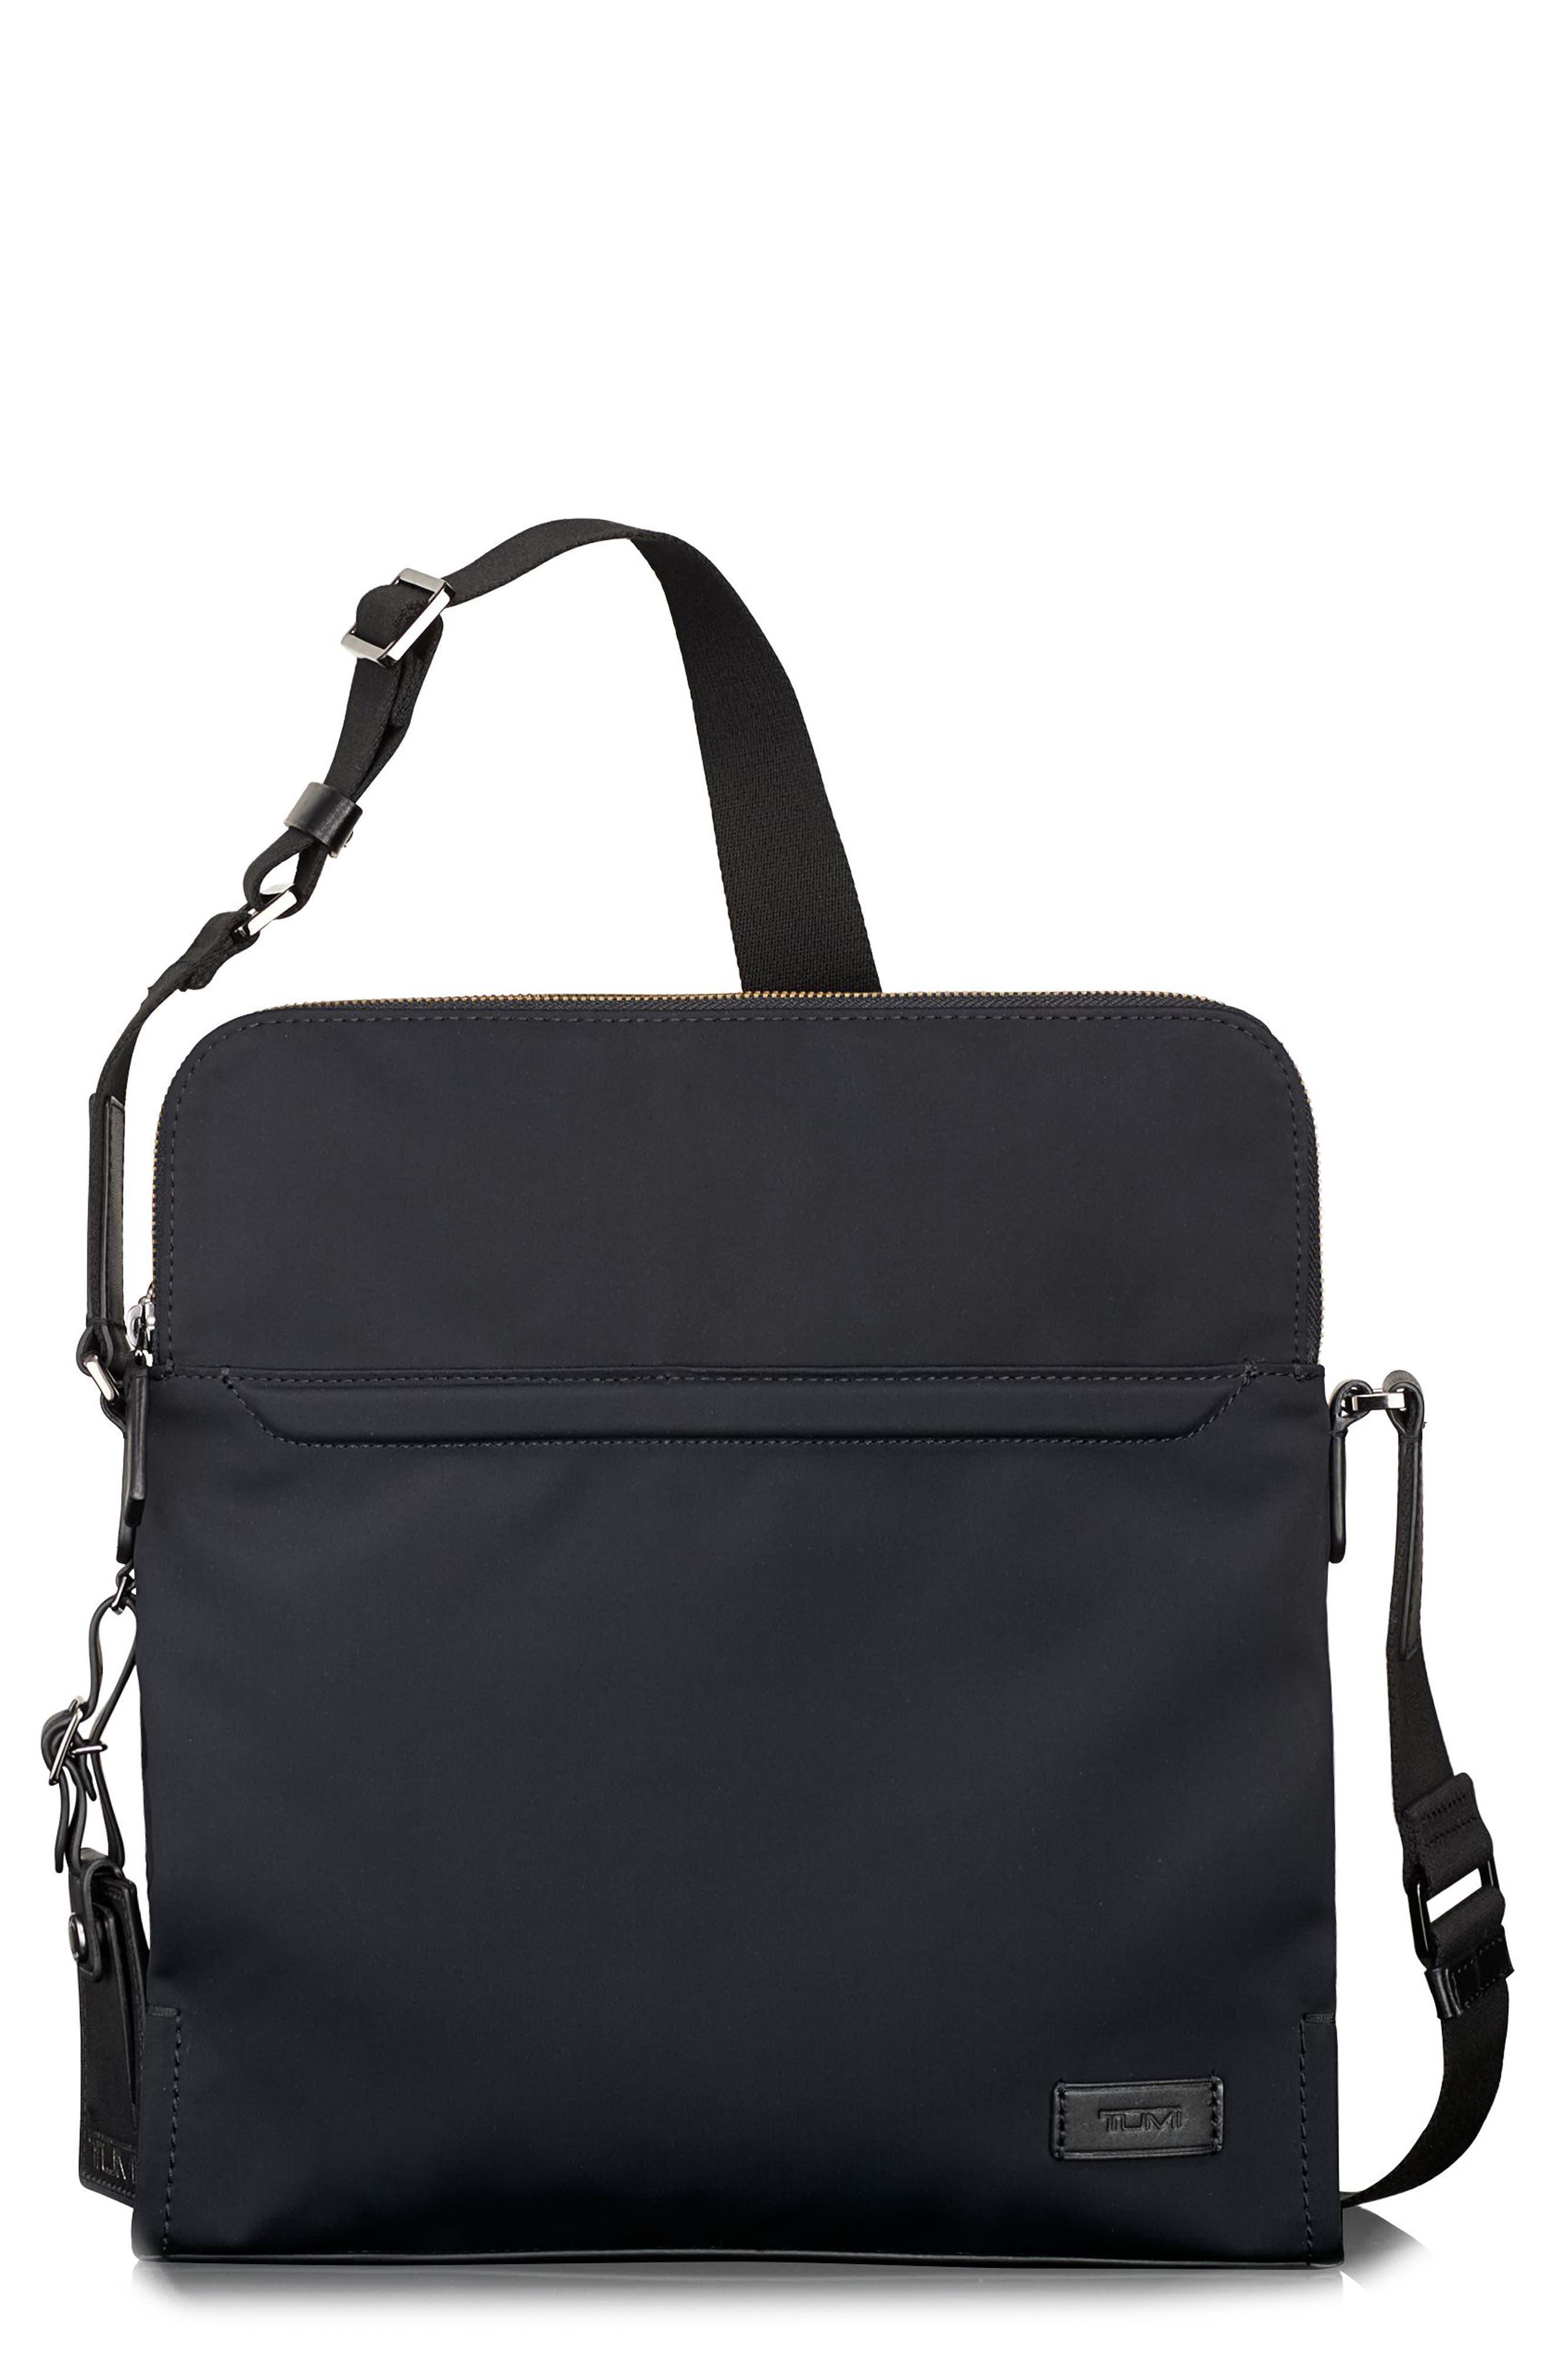 Harrison Stratton Messenger Bag,                         Main,                         color, Black Nylon